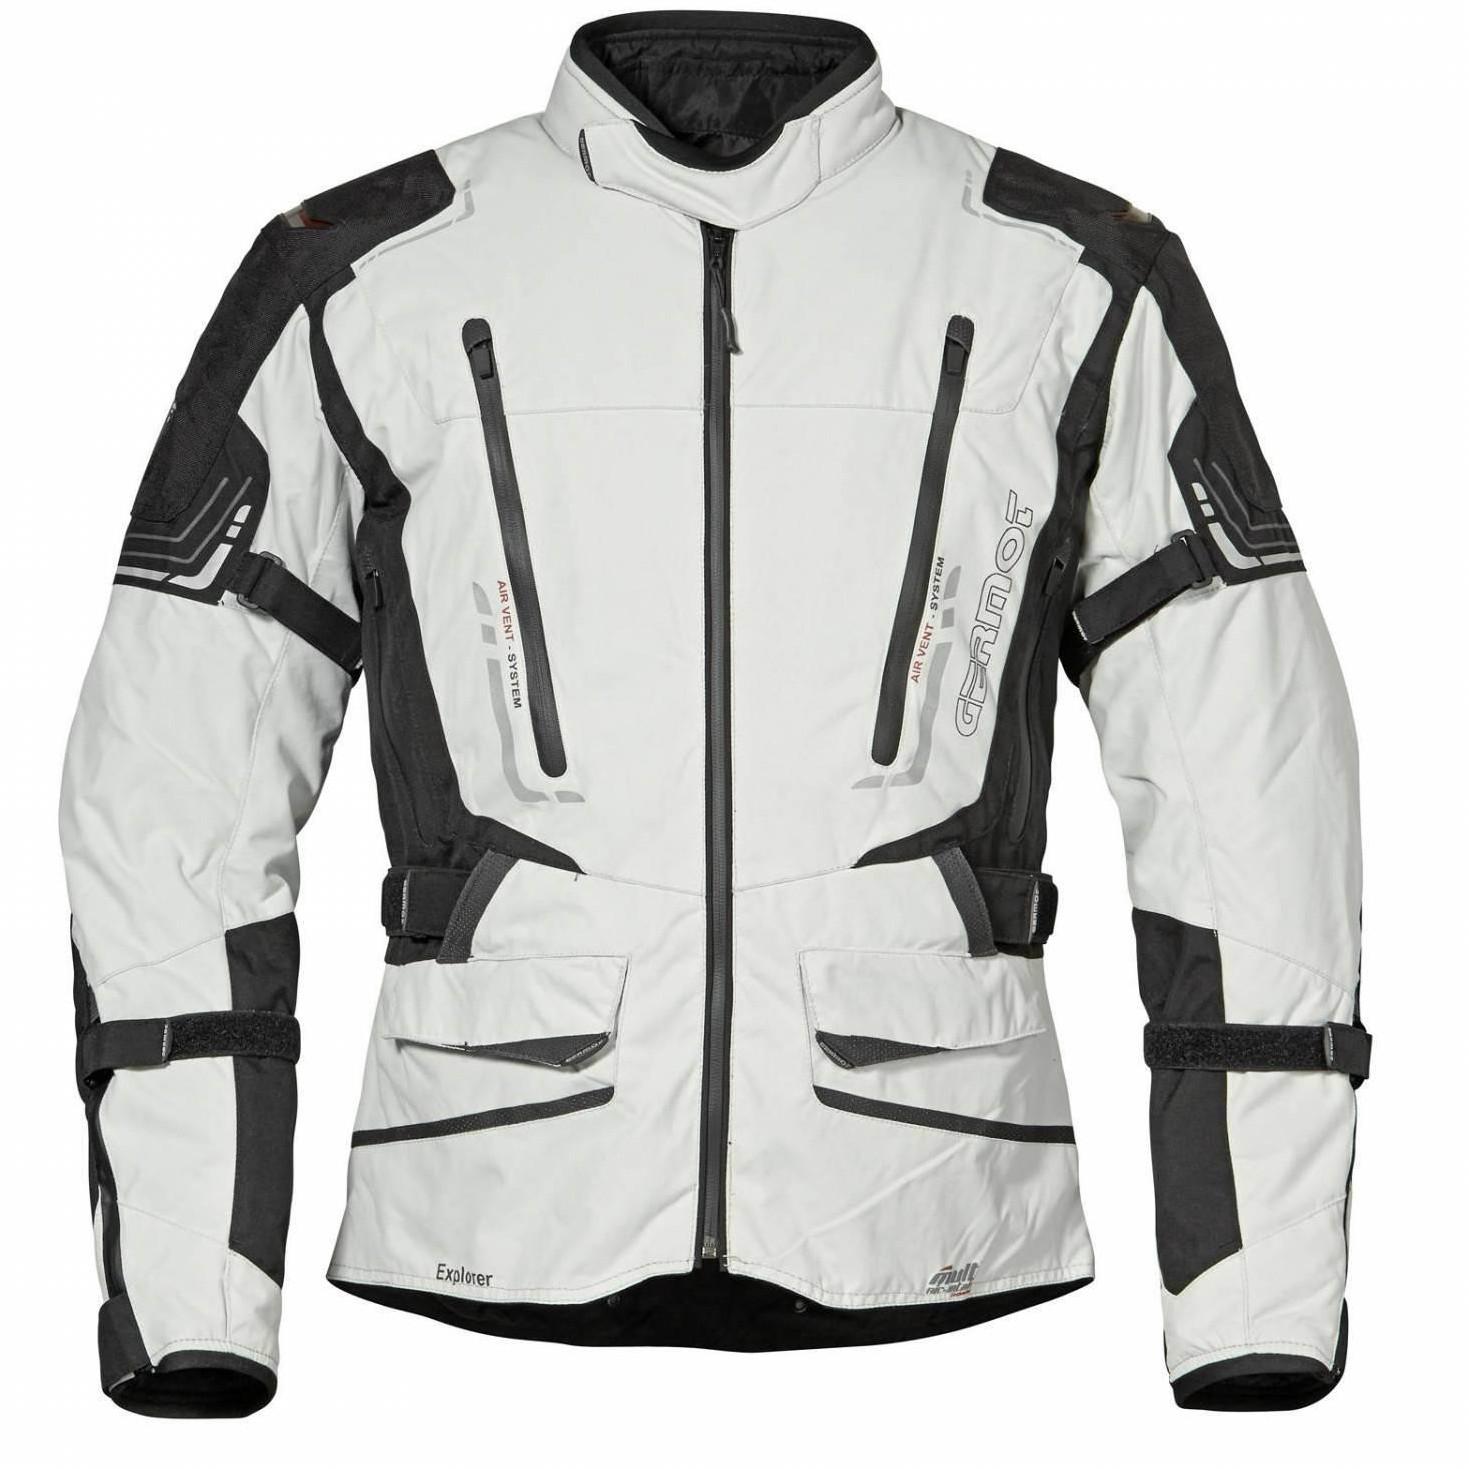 Germot Explorer Jacket light grey/black